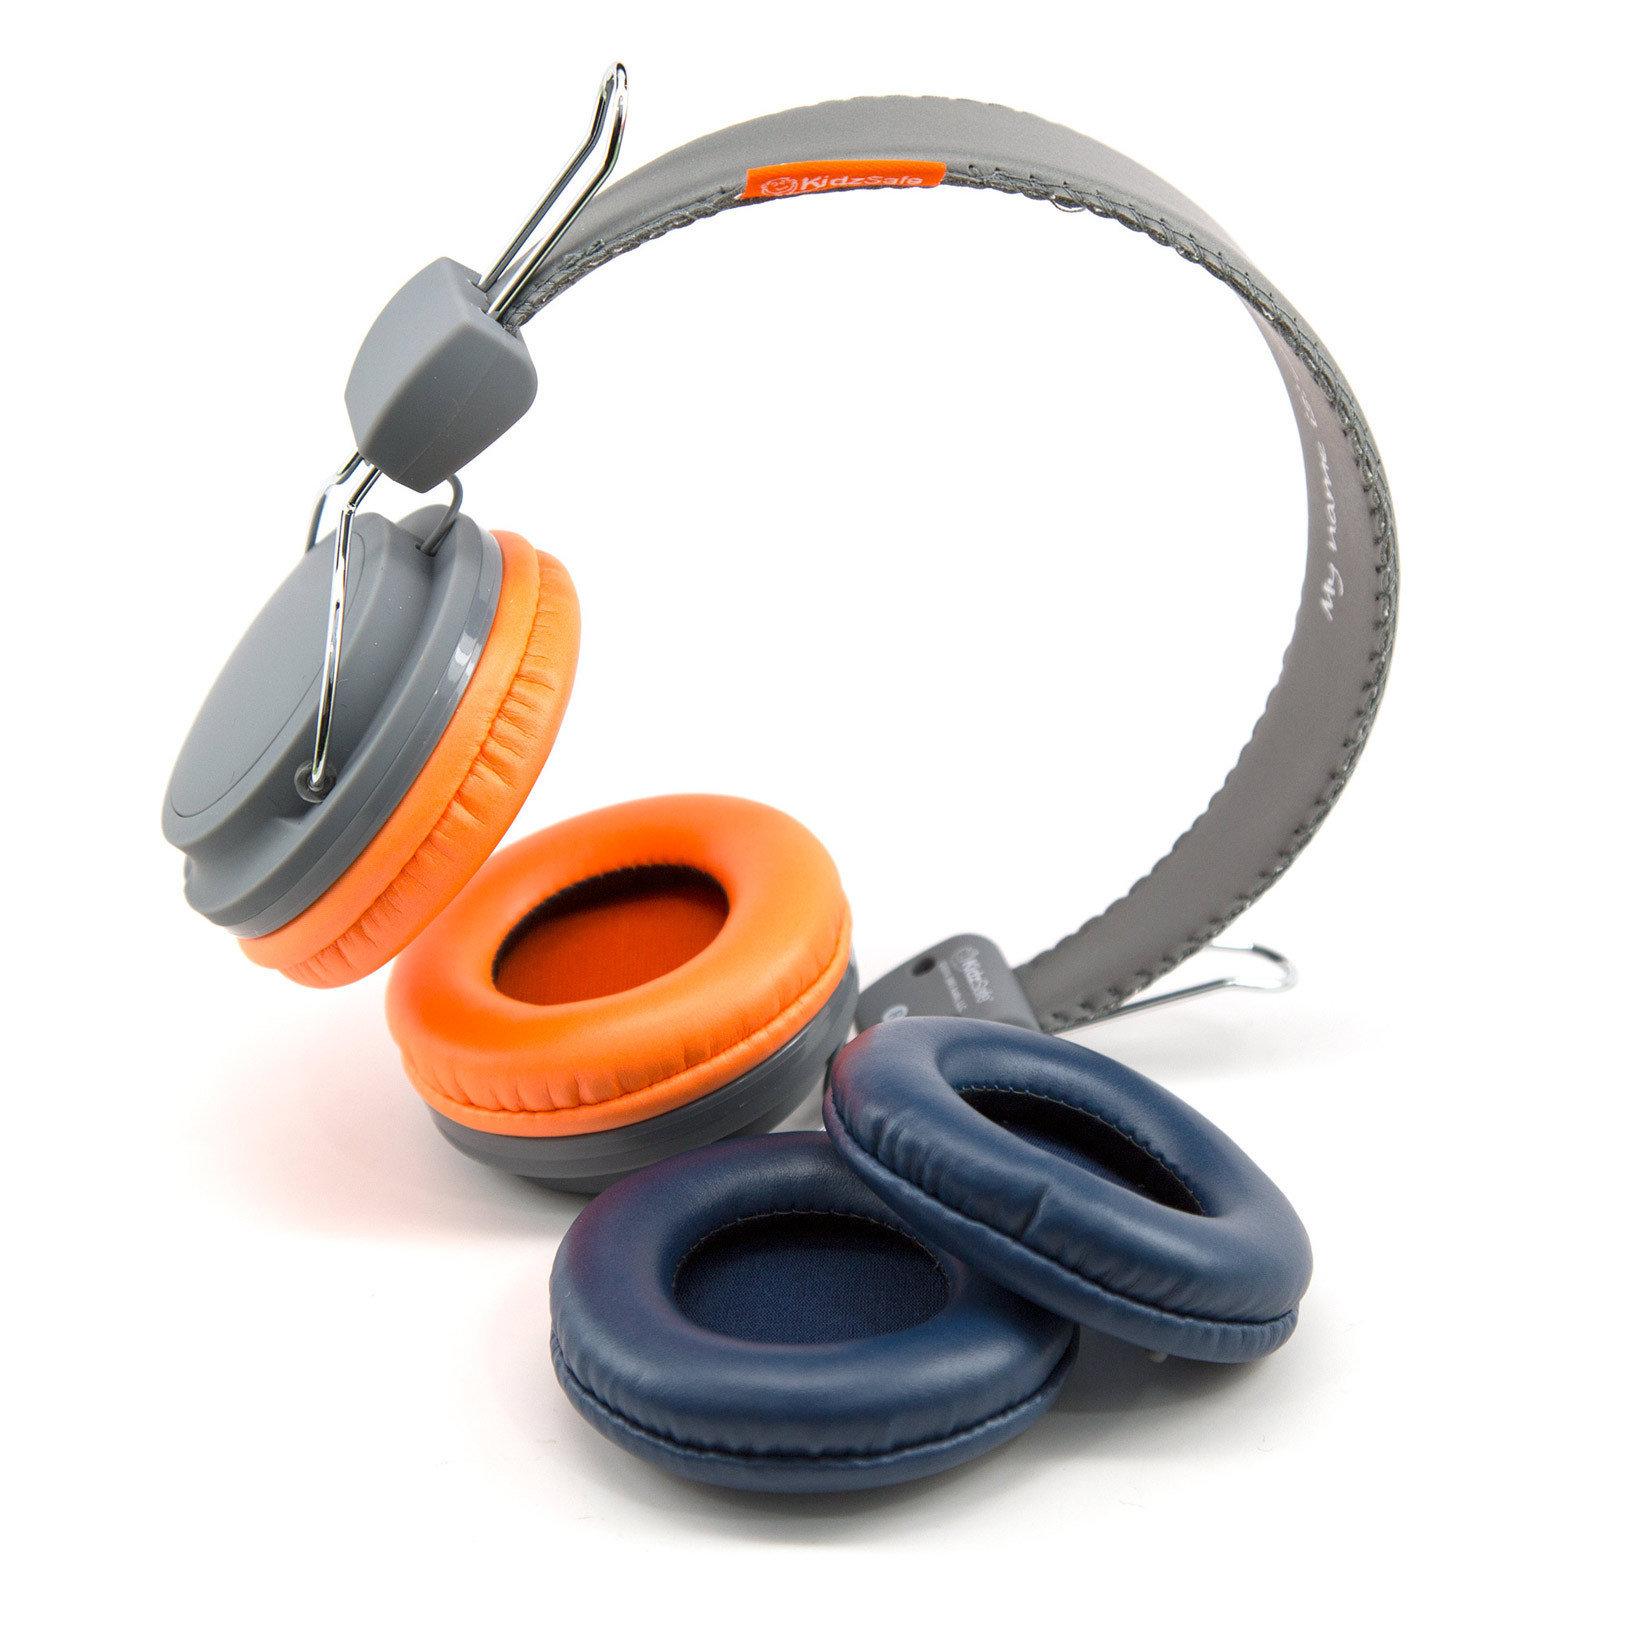 KidzSafe Volume Controlling Headphones - Gray Color KS-2013-GRAY-HP